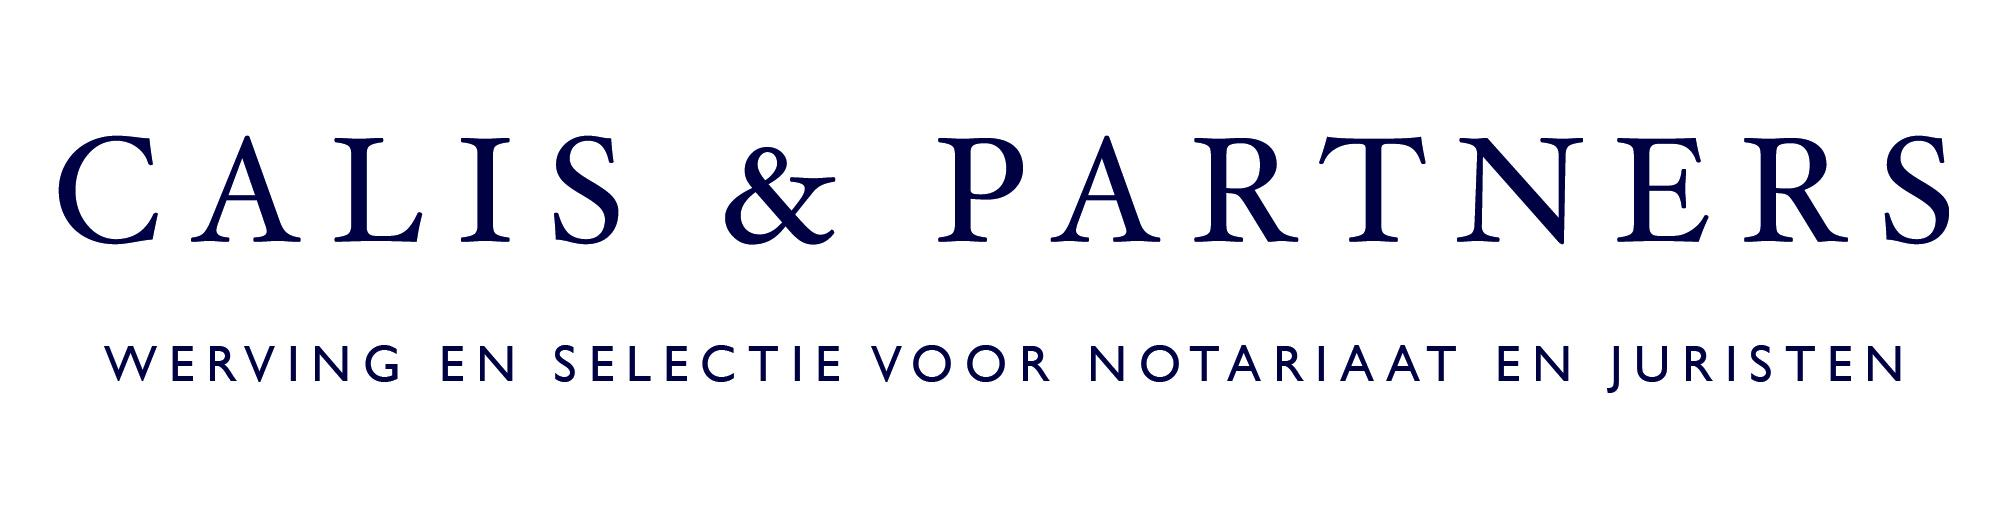 Kandidaat notaris familierecht in Bussum